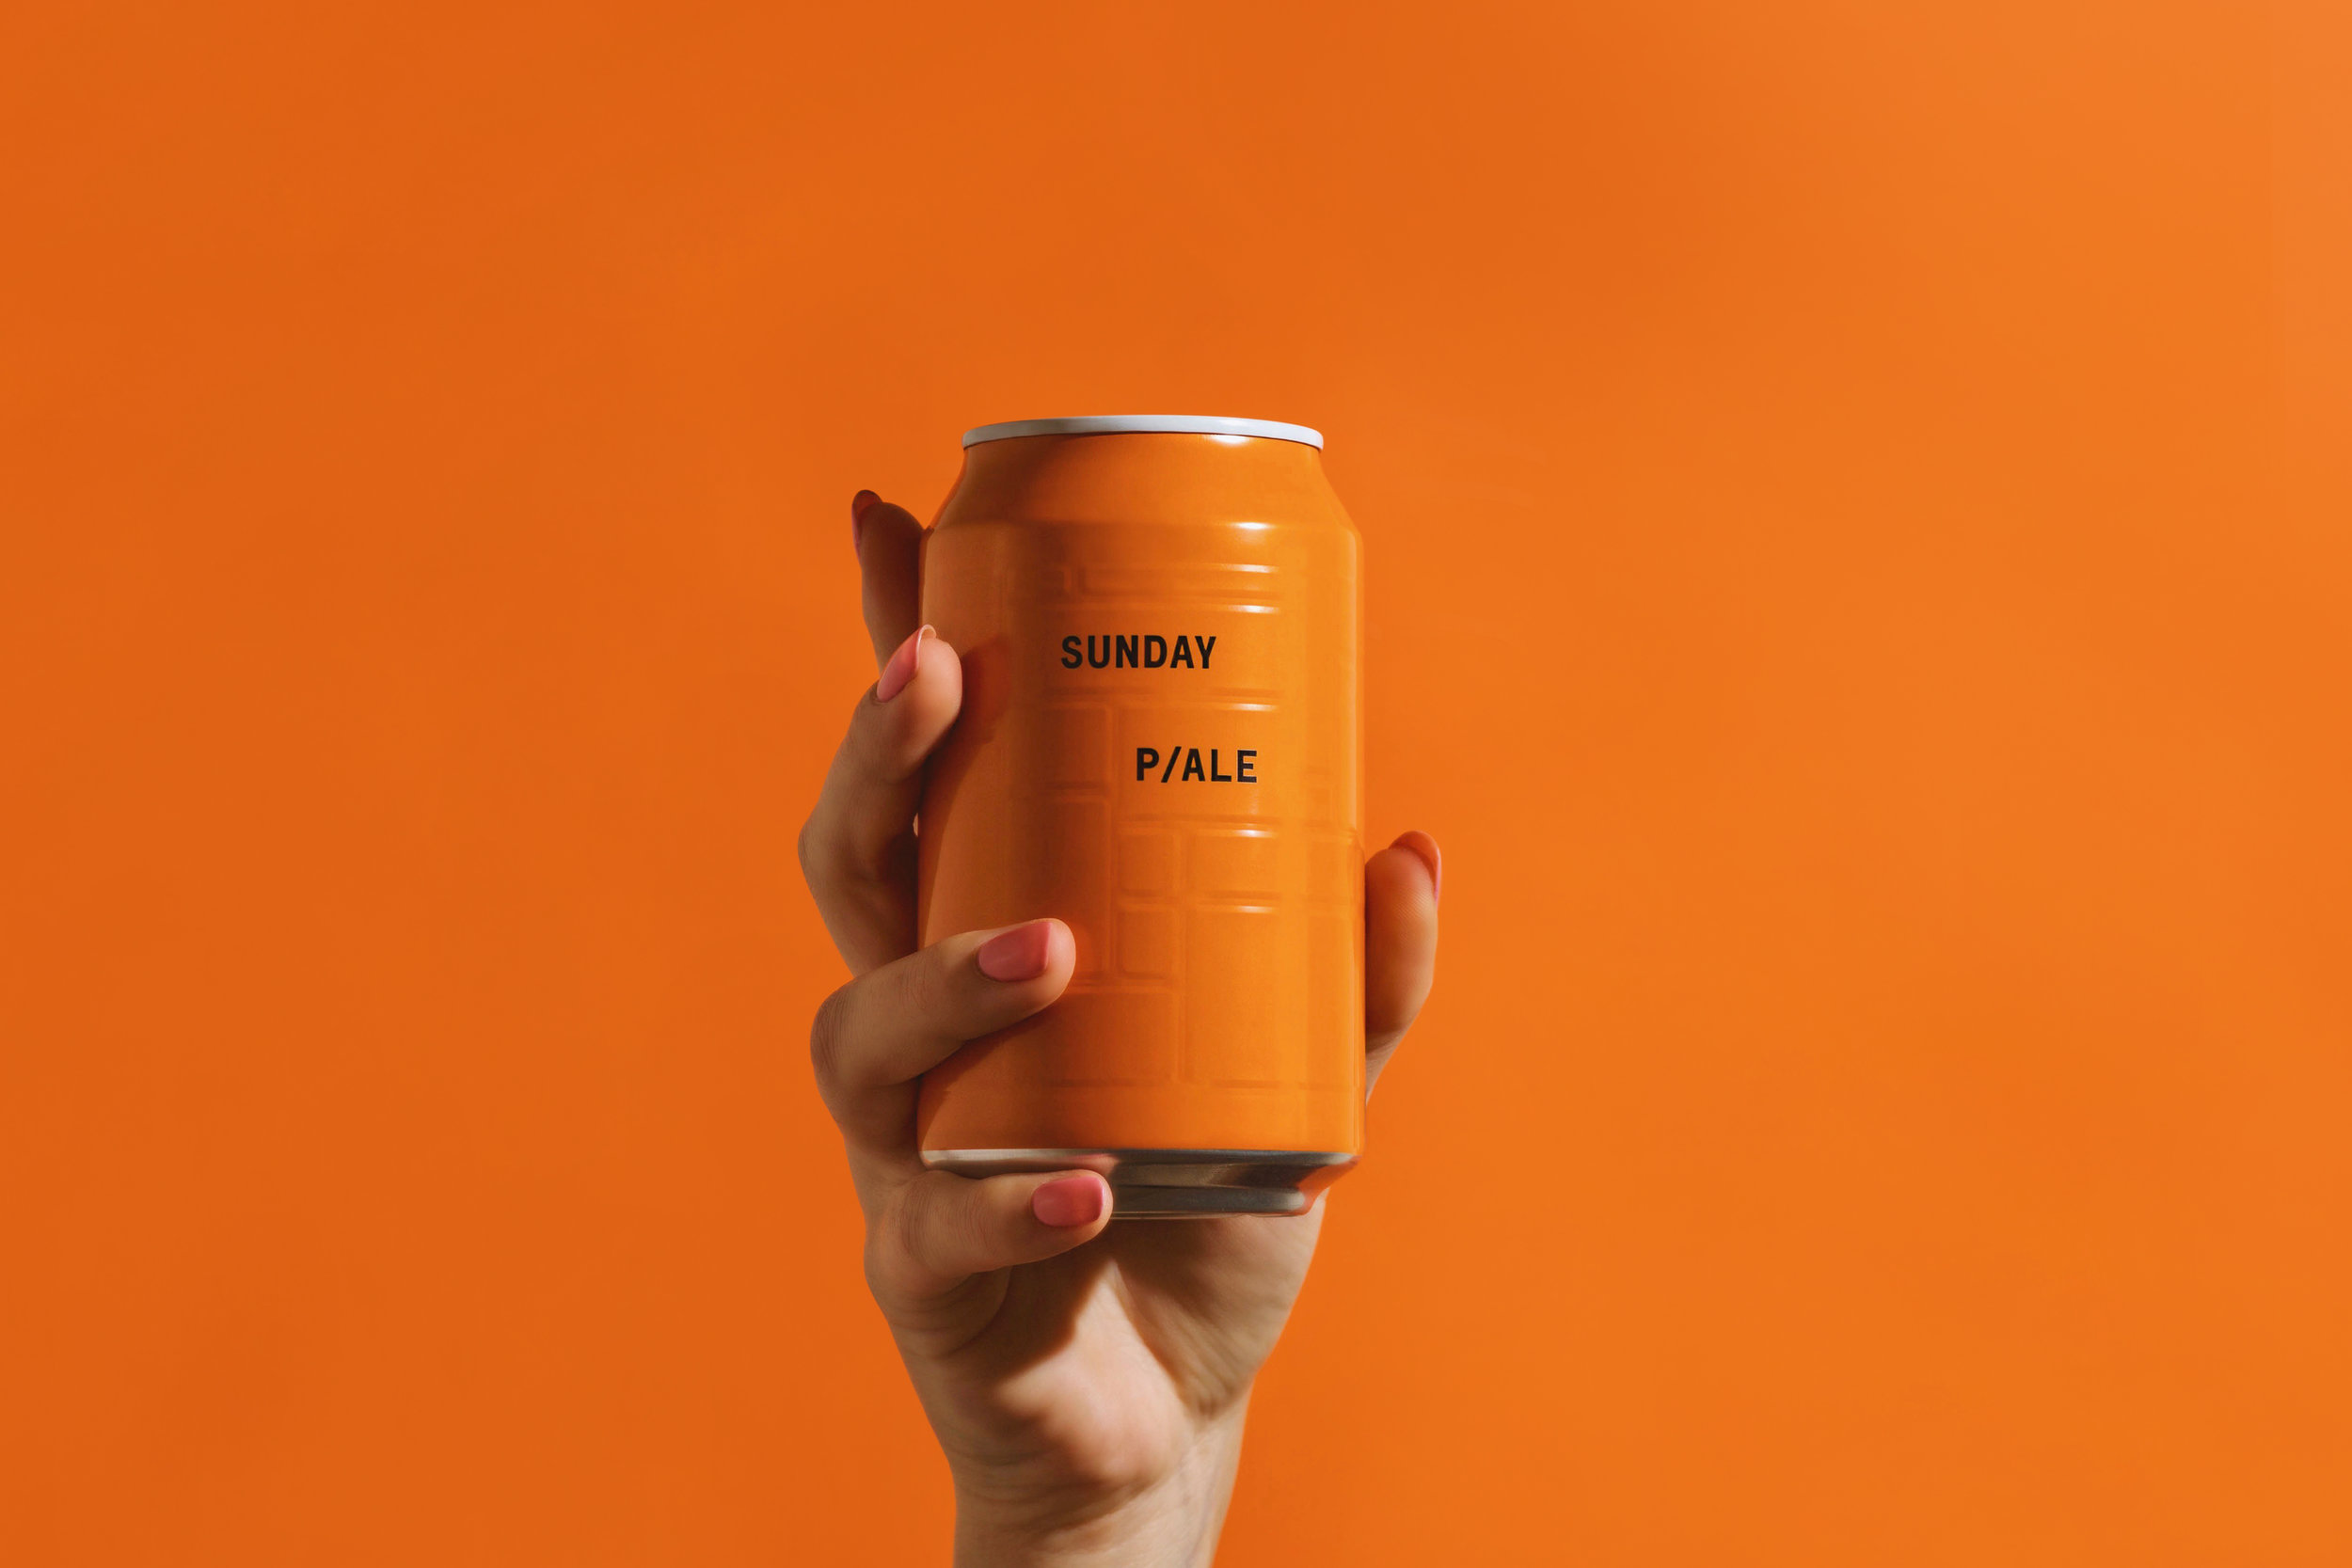 Beer & Branding: And Union Beer